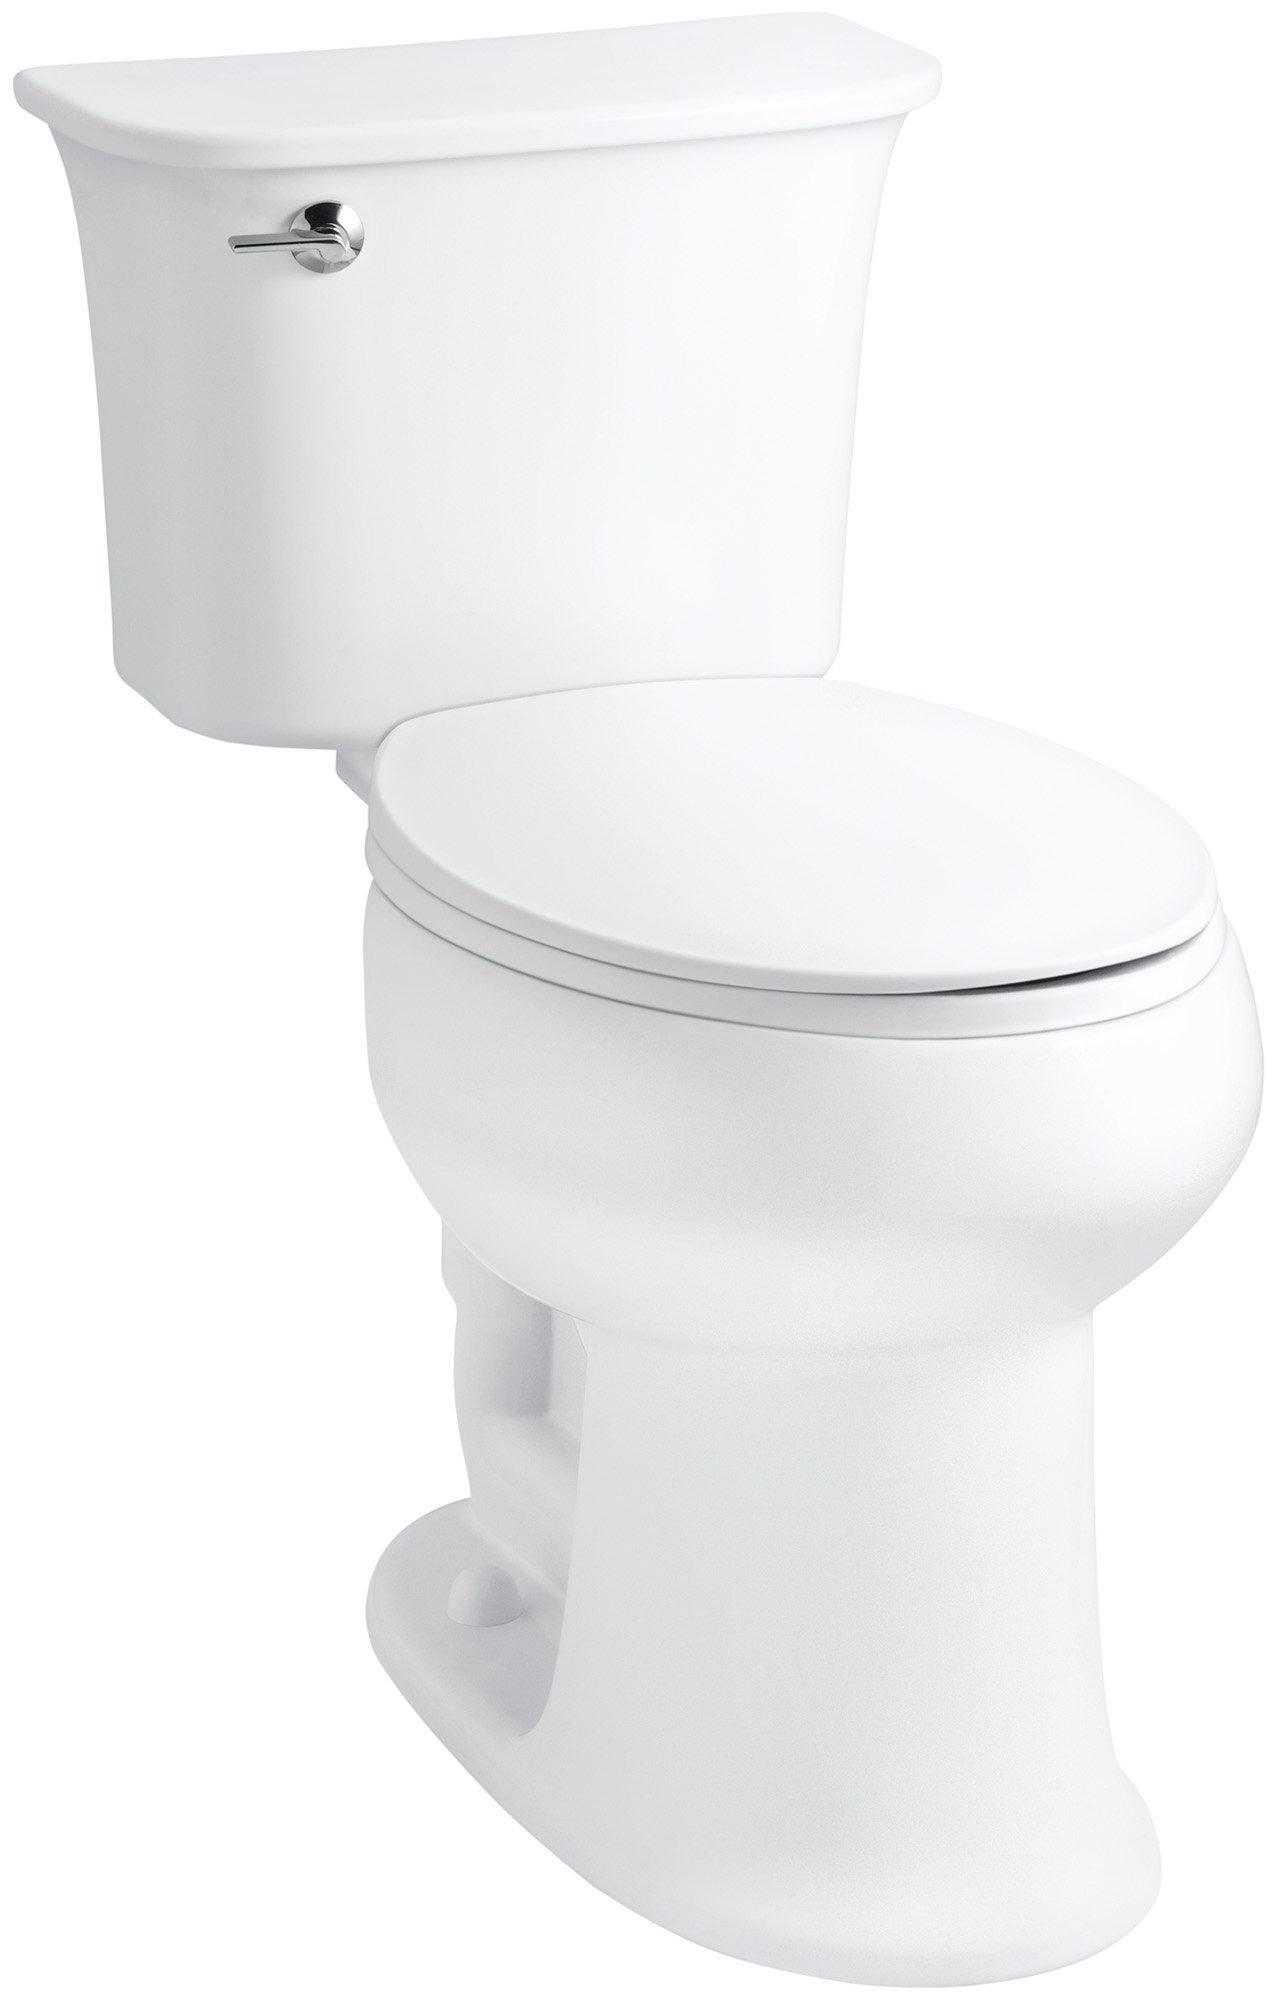 Sterling 402077-0 Stinson ADA Luxury Height Elongated Toilet, White